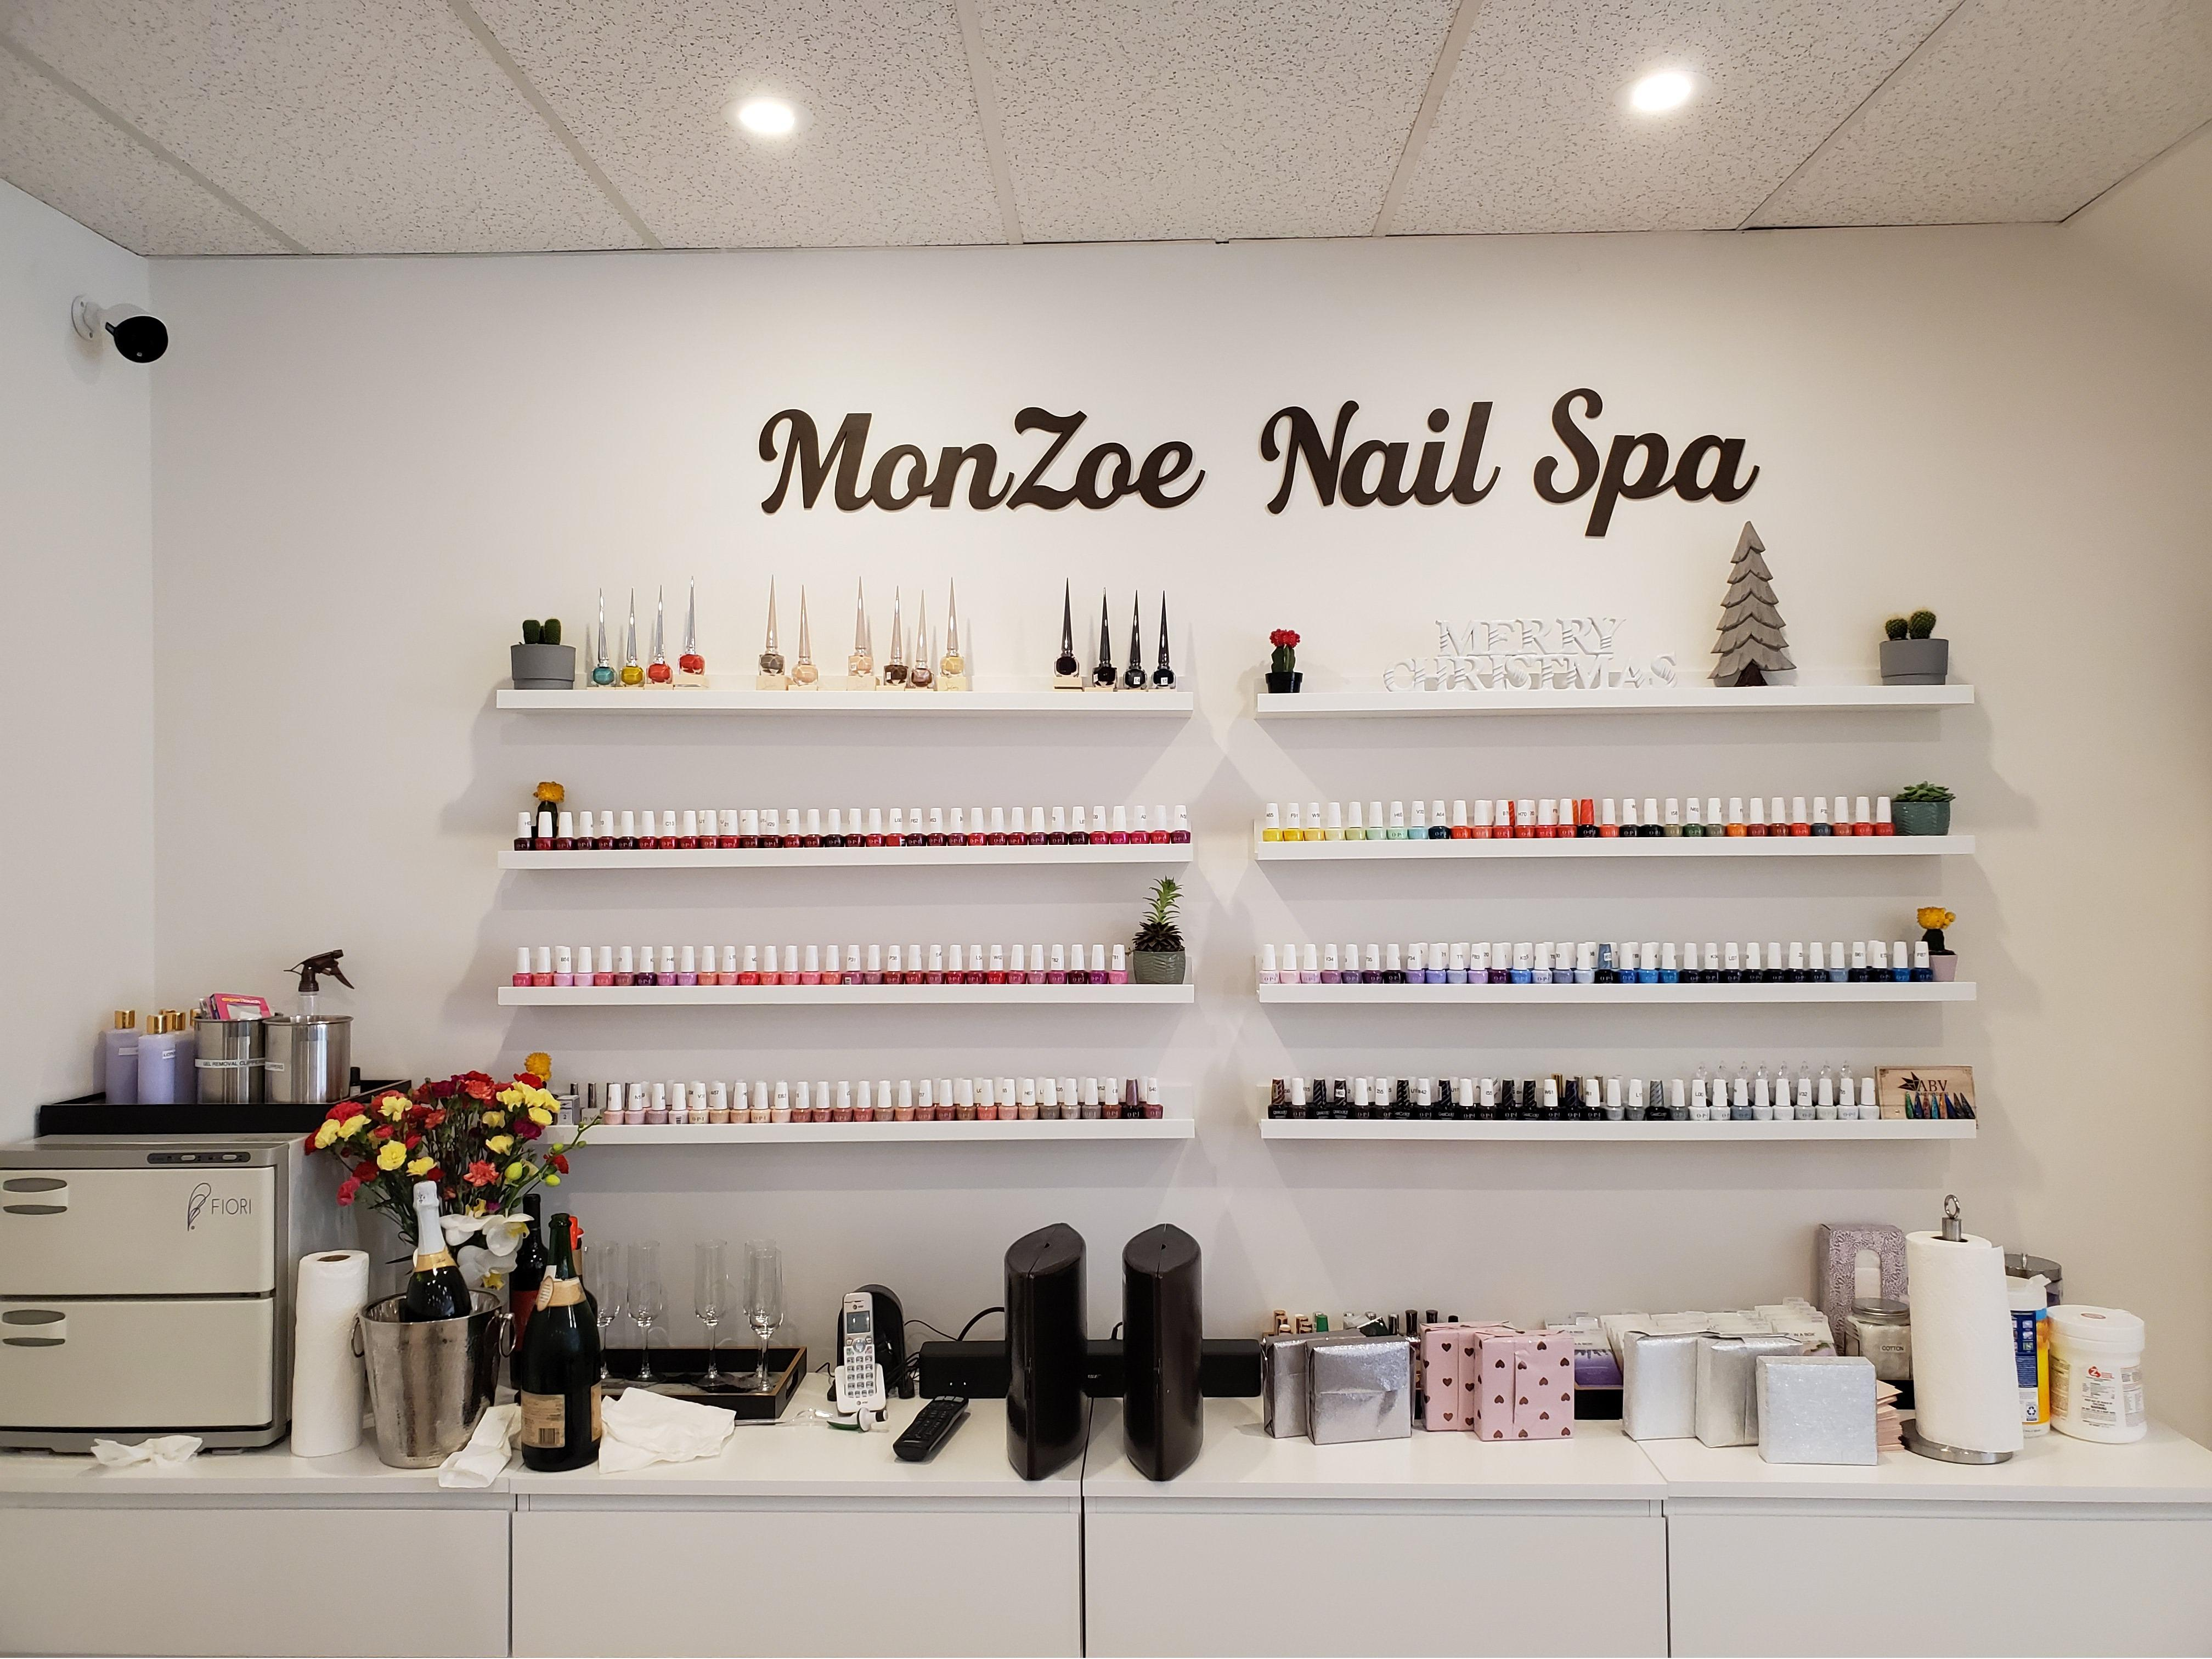 MonZoe Nail Spa